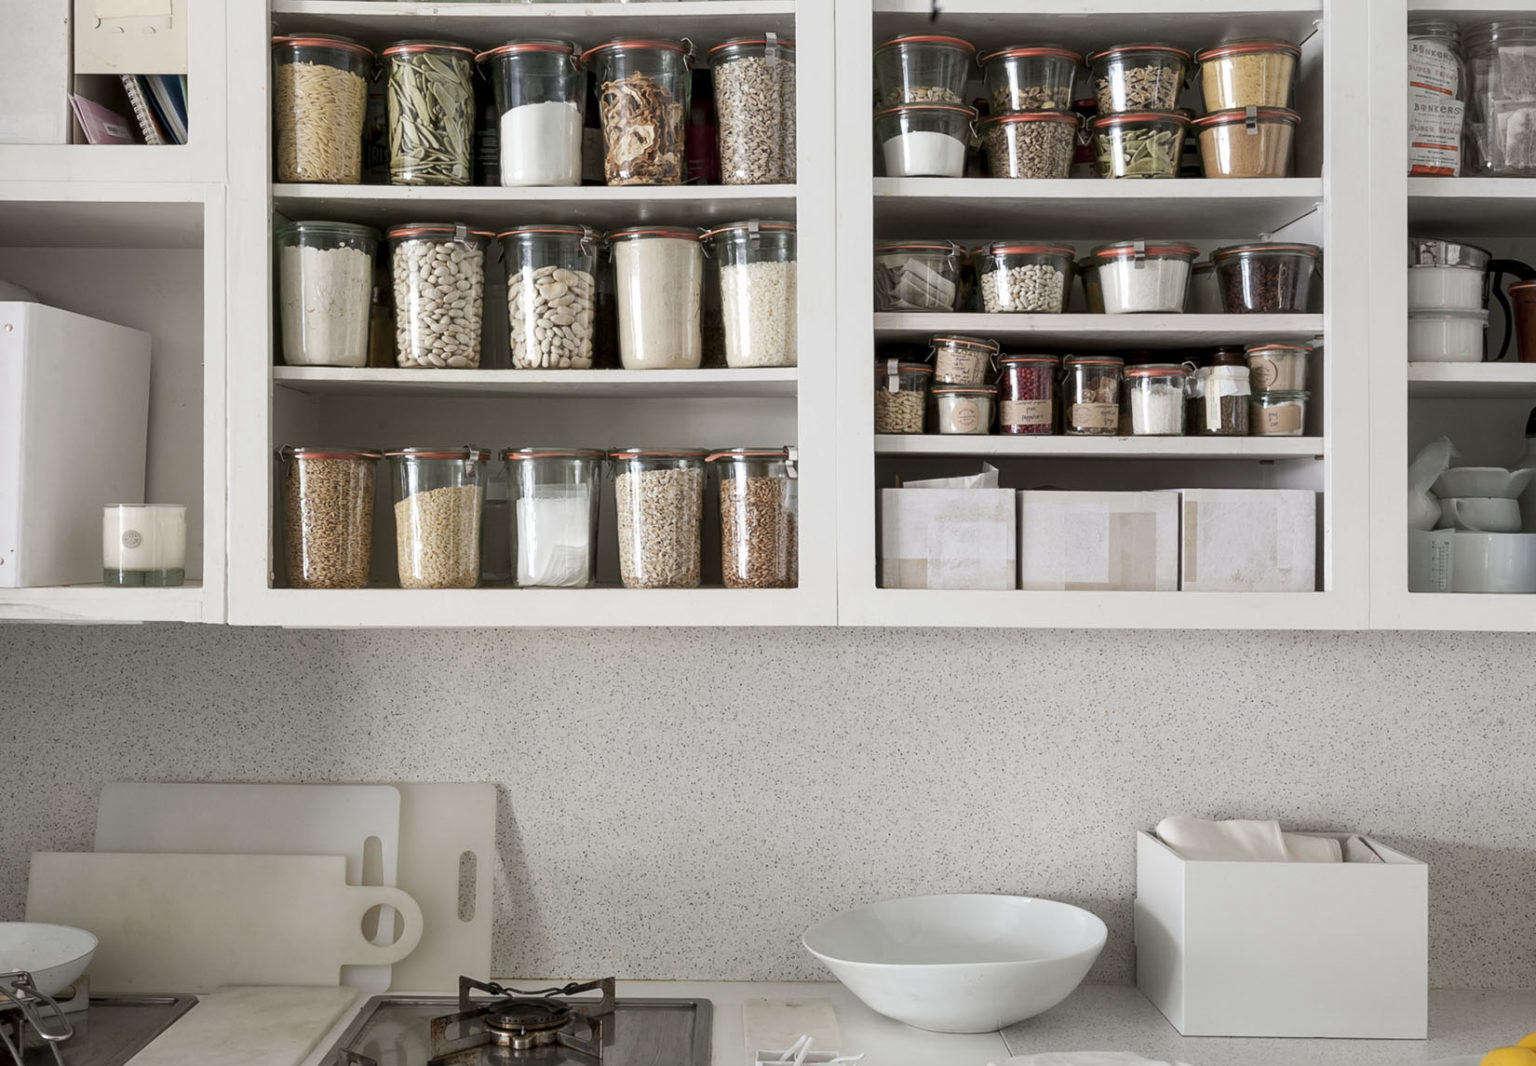 Michaela Scherrer's Kitchen Cabinets in Pasadena, CA, Photo by Matthew Williams for Remodelista